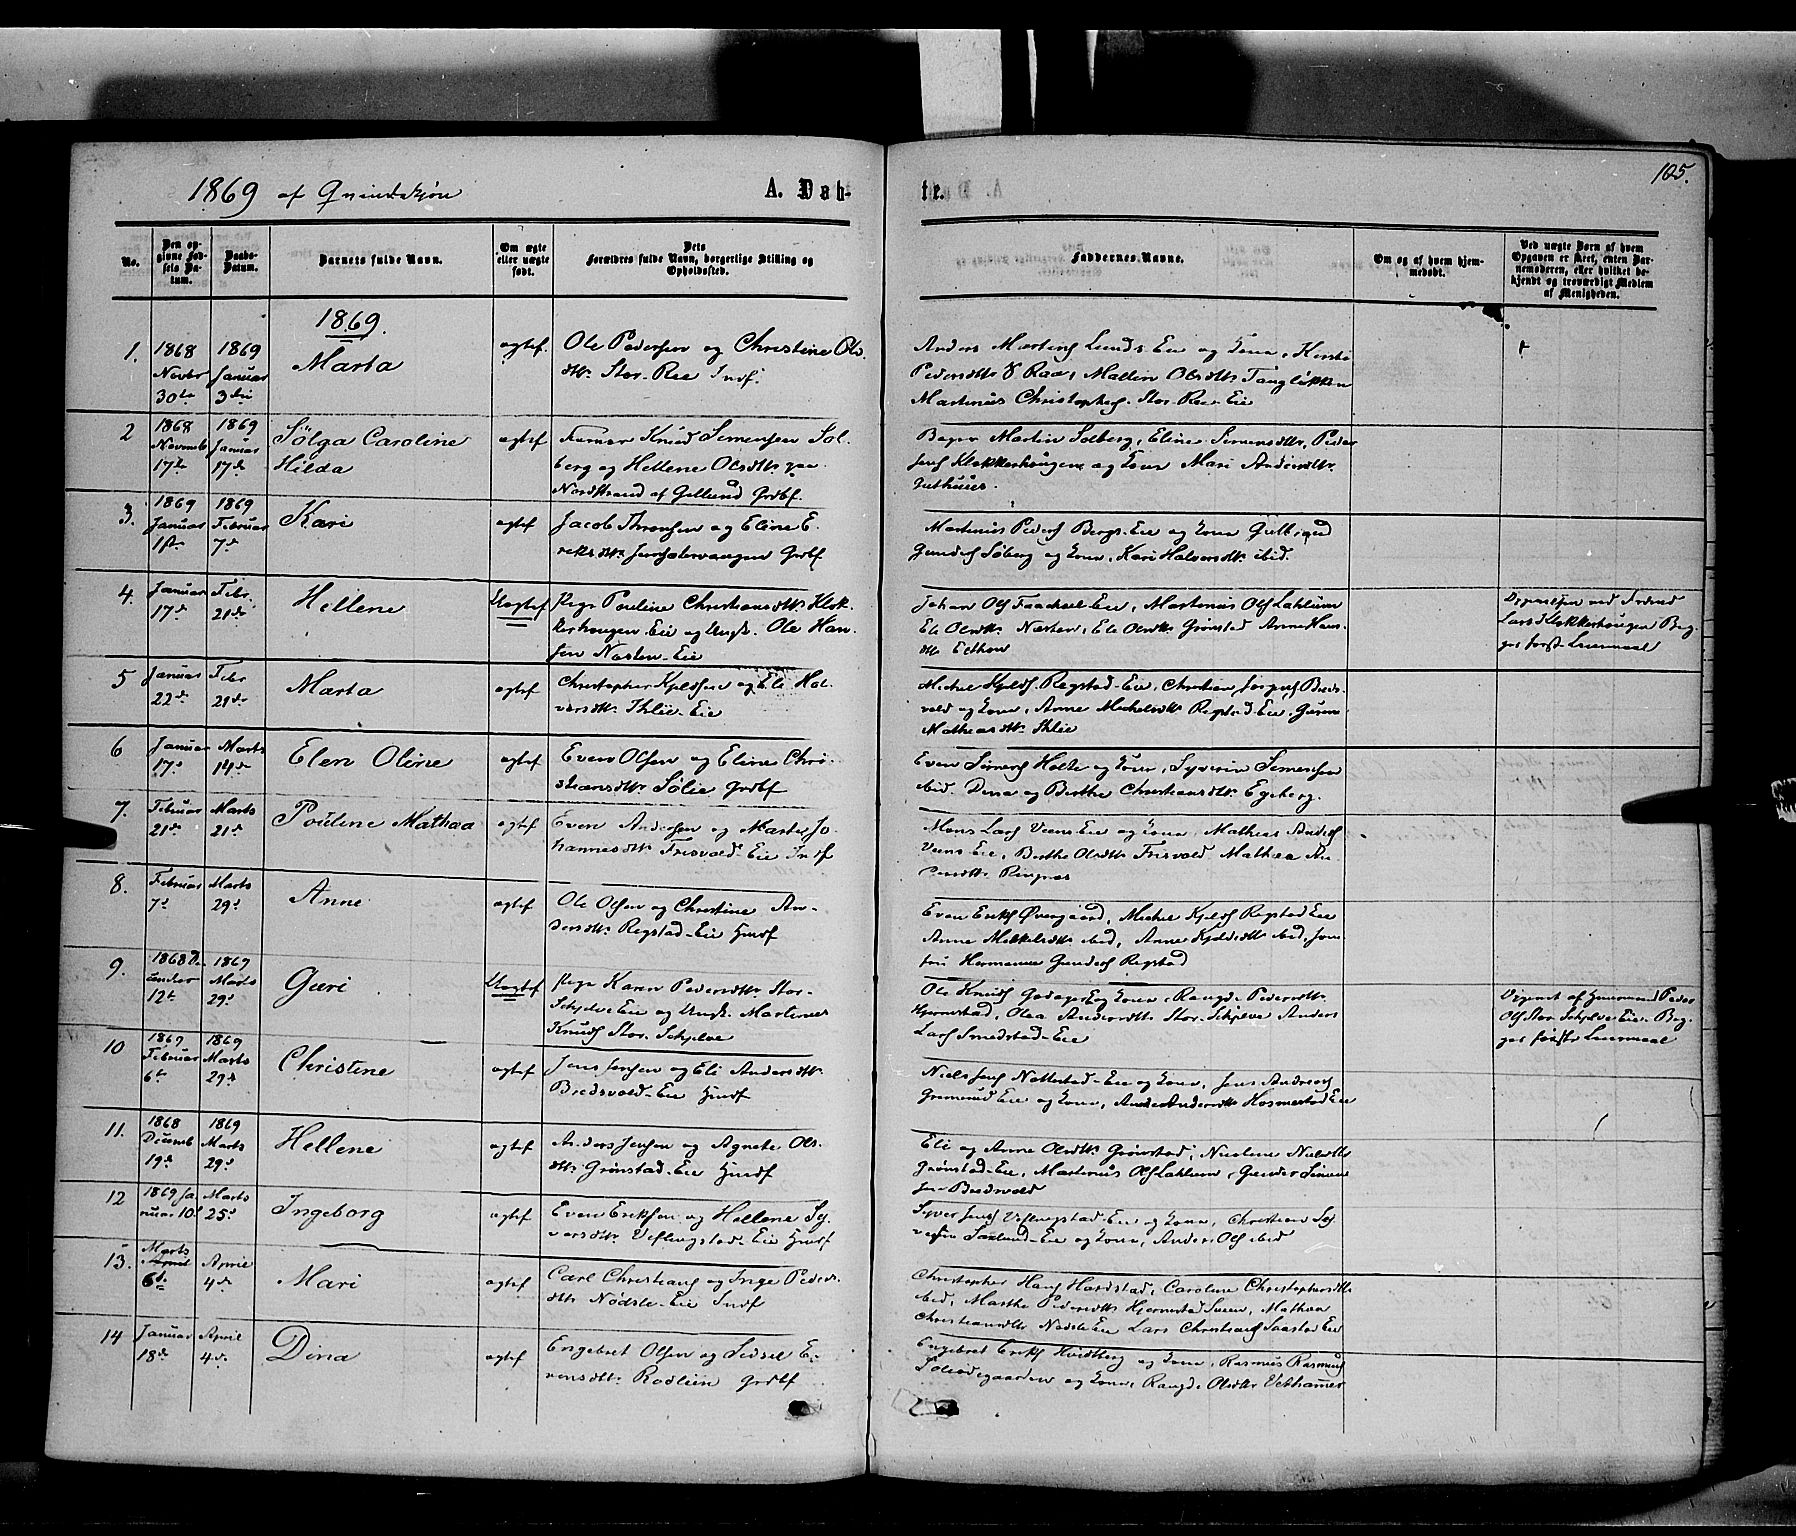 SAH, Stange prestekontor, K/L0013: Ministerialbok nr. 13, 1862-1879, s. 105